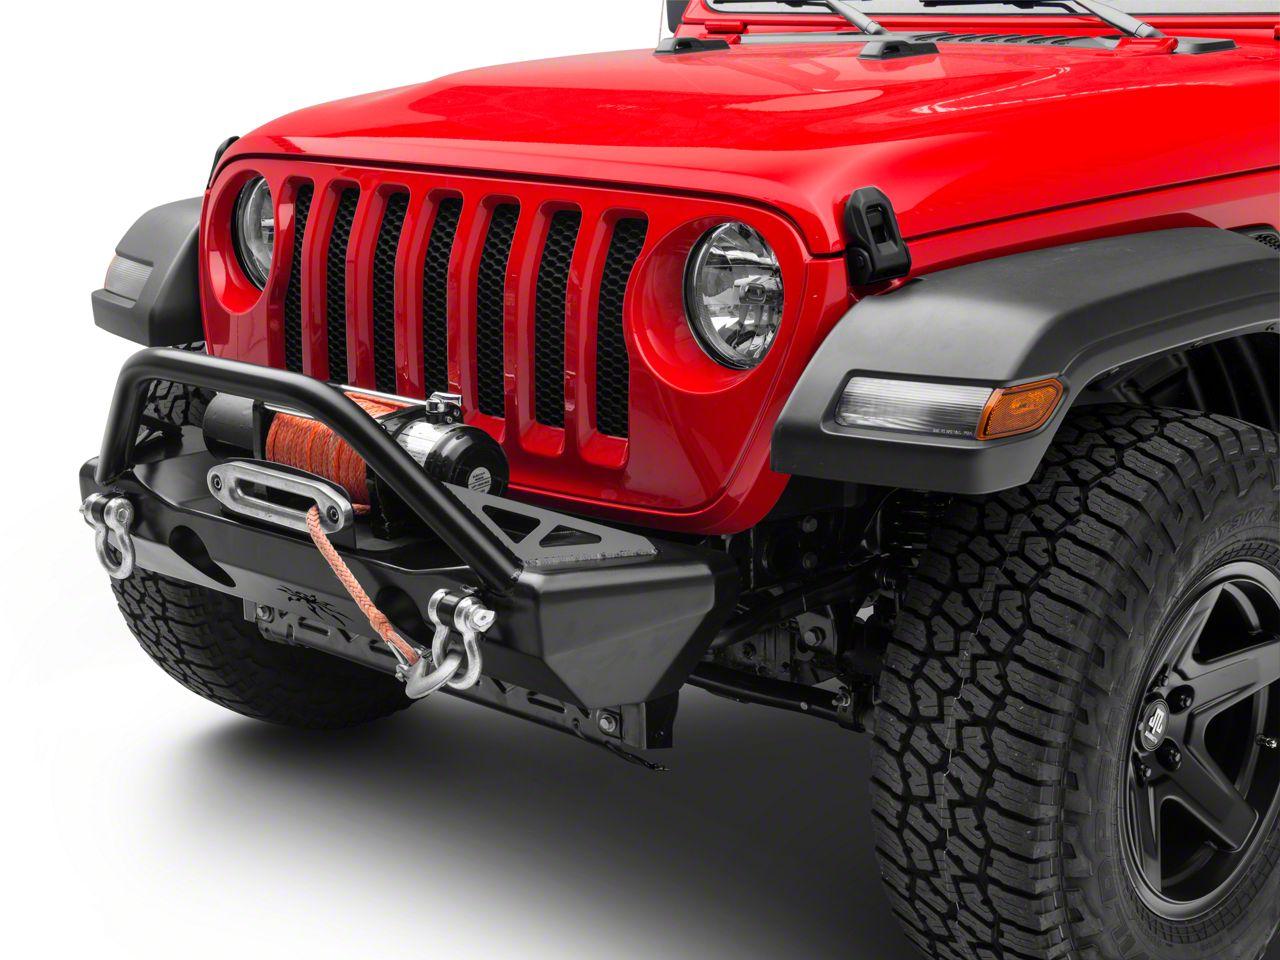 Poison Spyder Crawler Front Bumper - SpyderShell Armor Coat (2018 Jeep Wrangler JL)